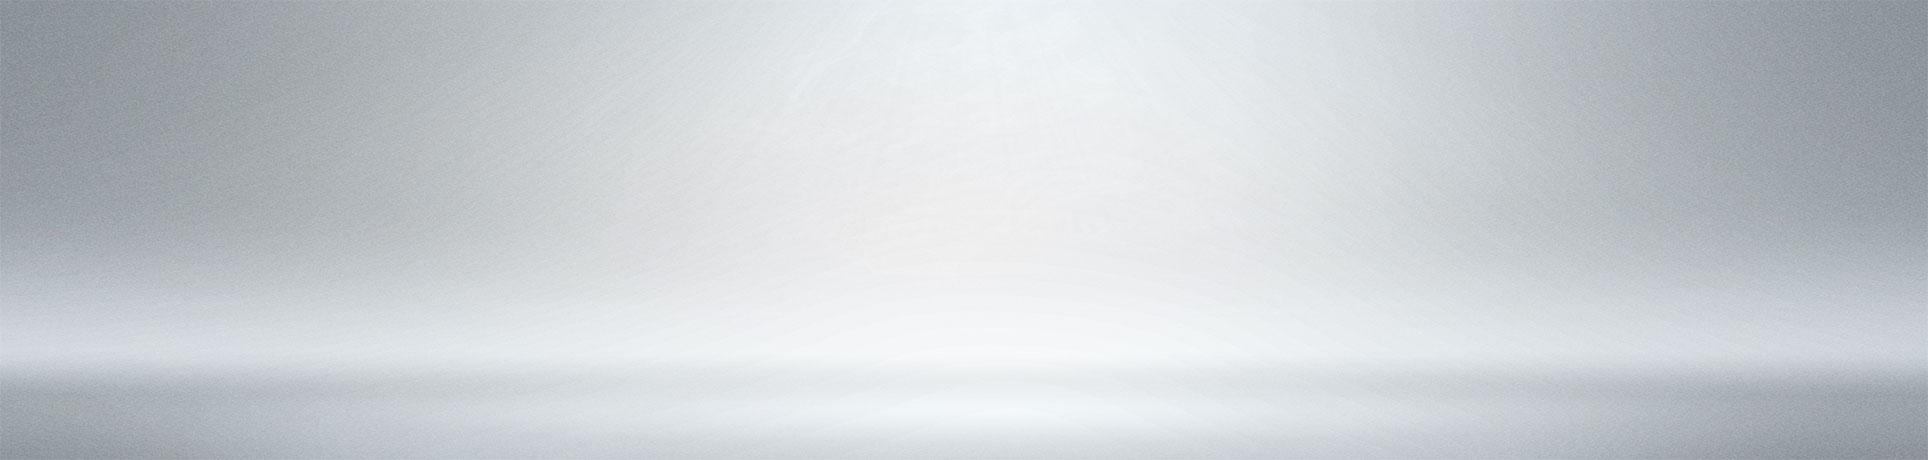 Slider-04-Background